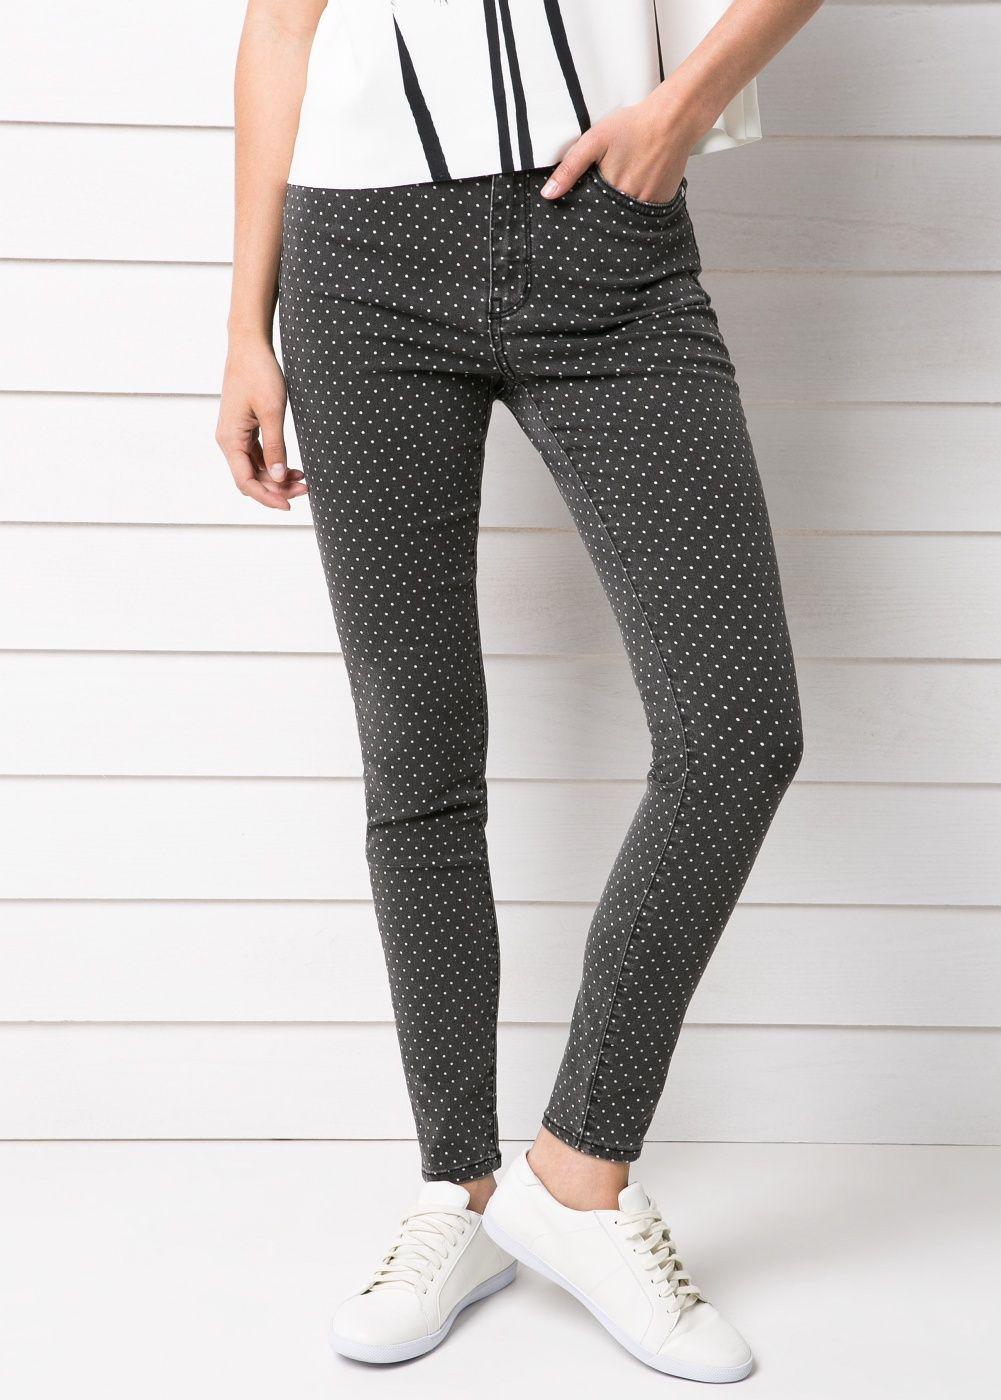 Kata Looks Jean Pinterest Skinny Skinny Femme Jeans 5w1z1FZqC